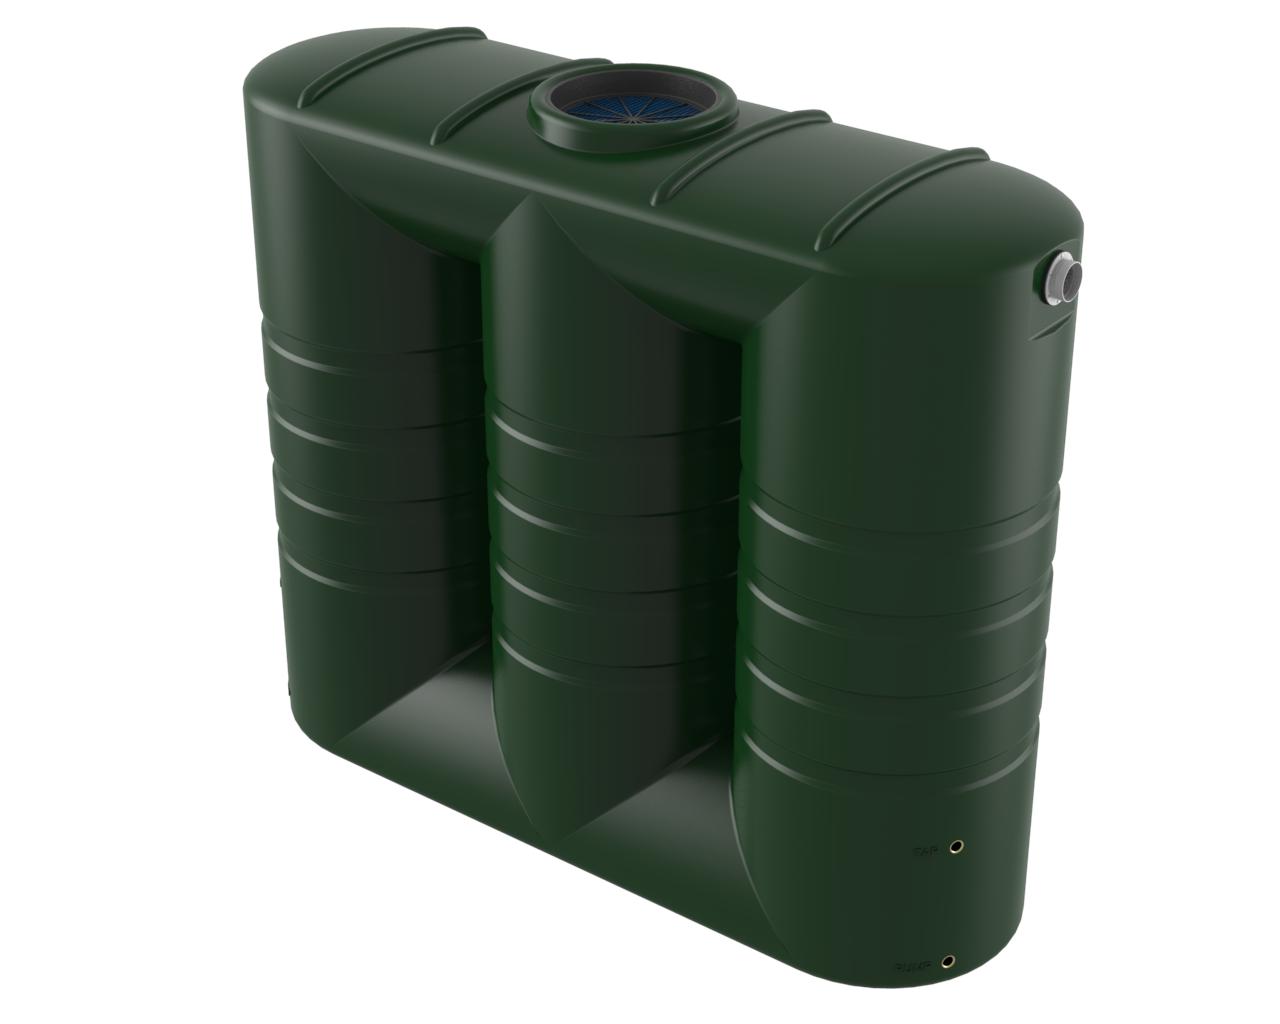 Bushmans Water Tanks Tank Supplies Hampton Park 3976 Fuel Filter Pic 6